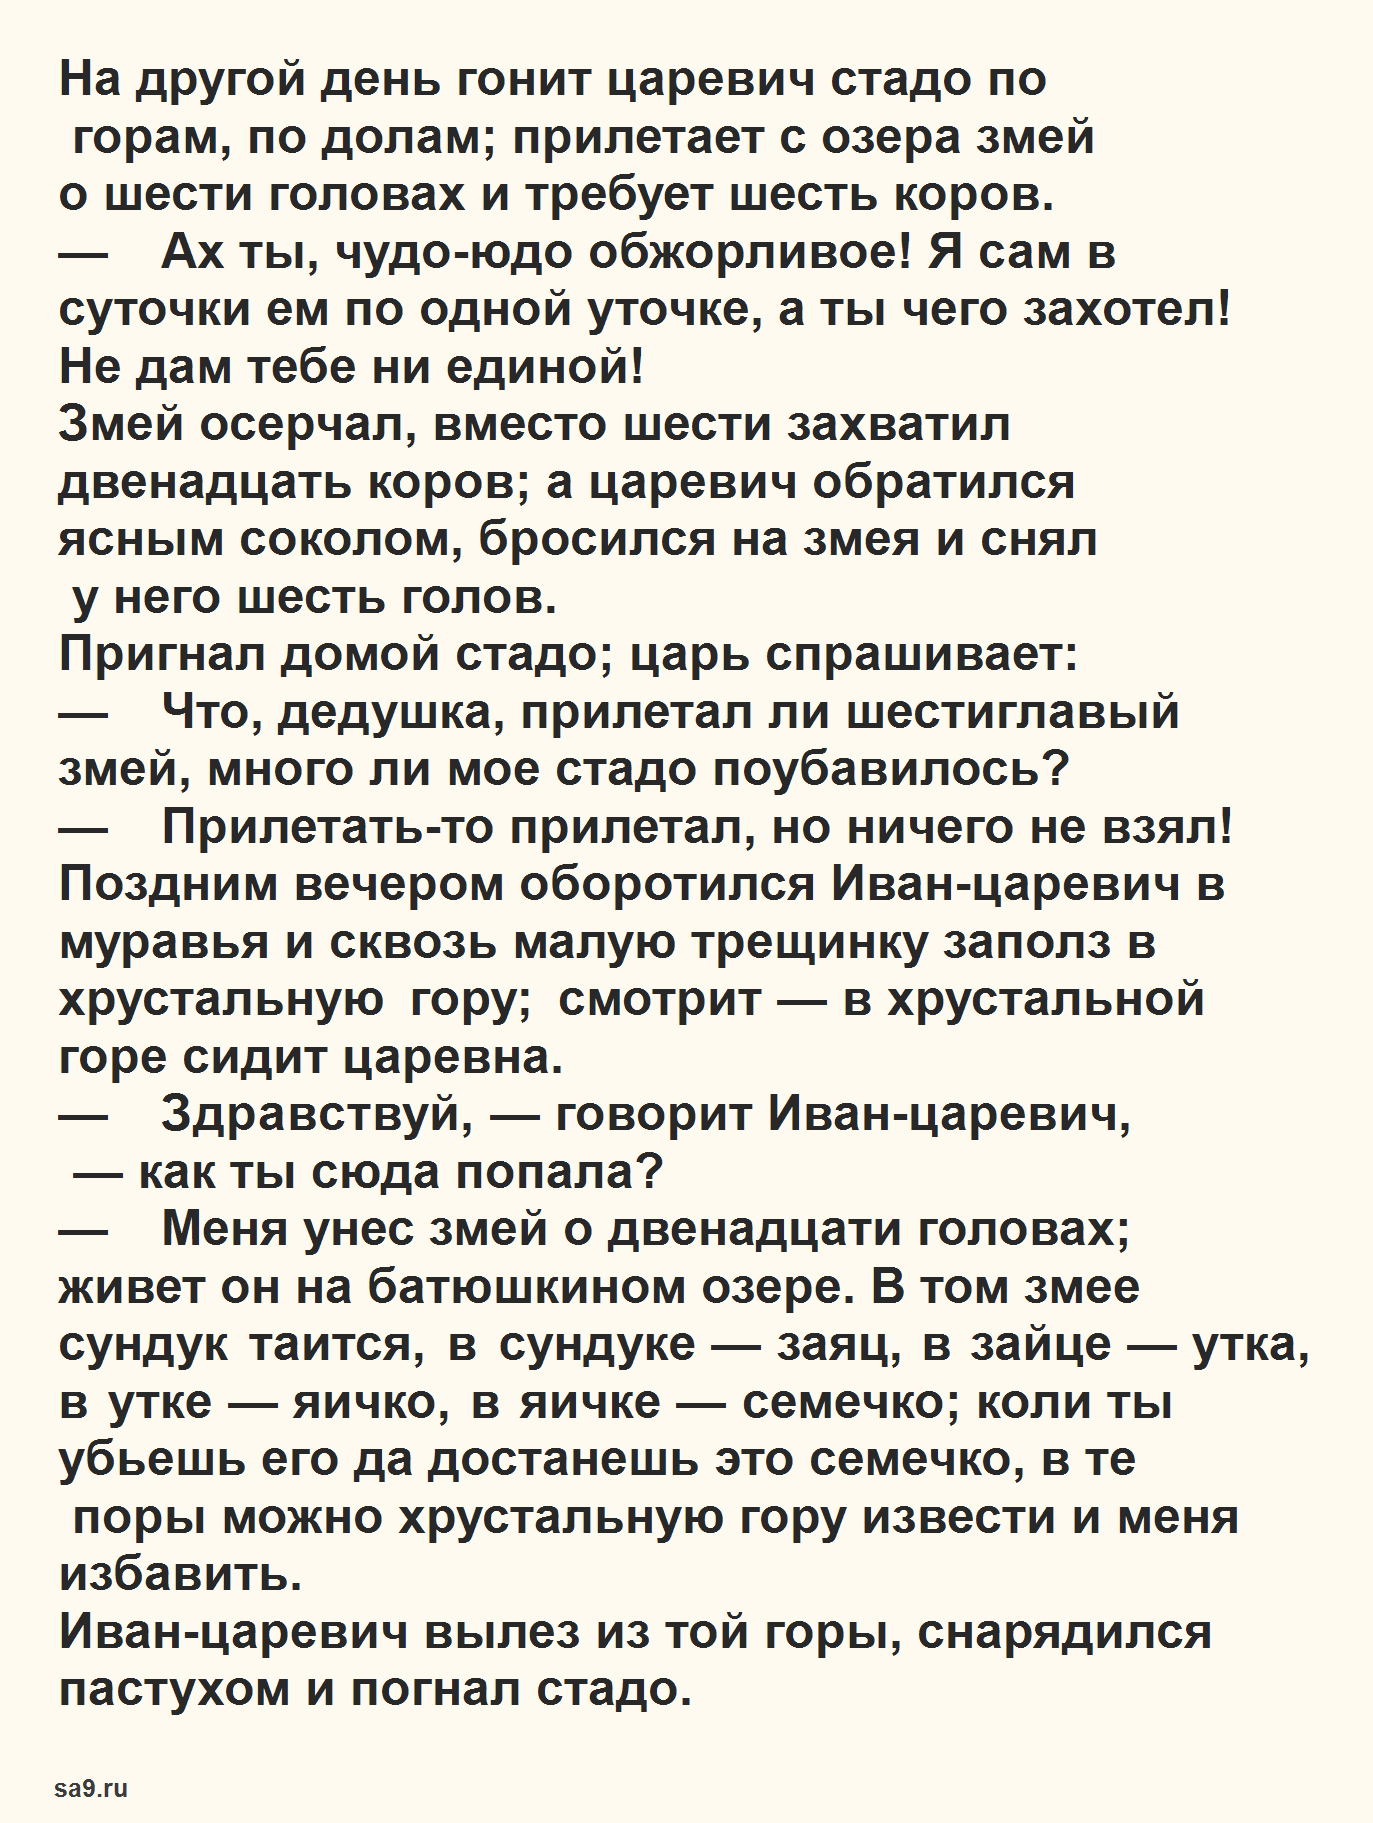 Читать русскую народную сказку - Хрустальная гора